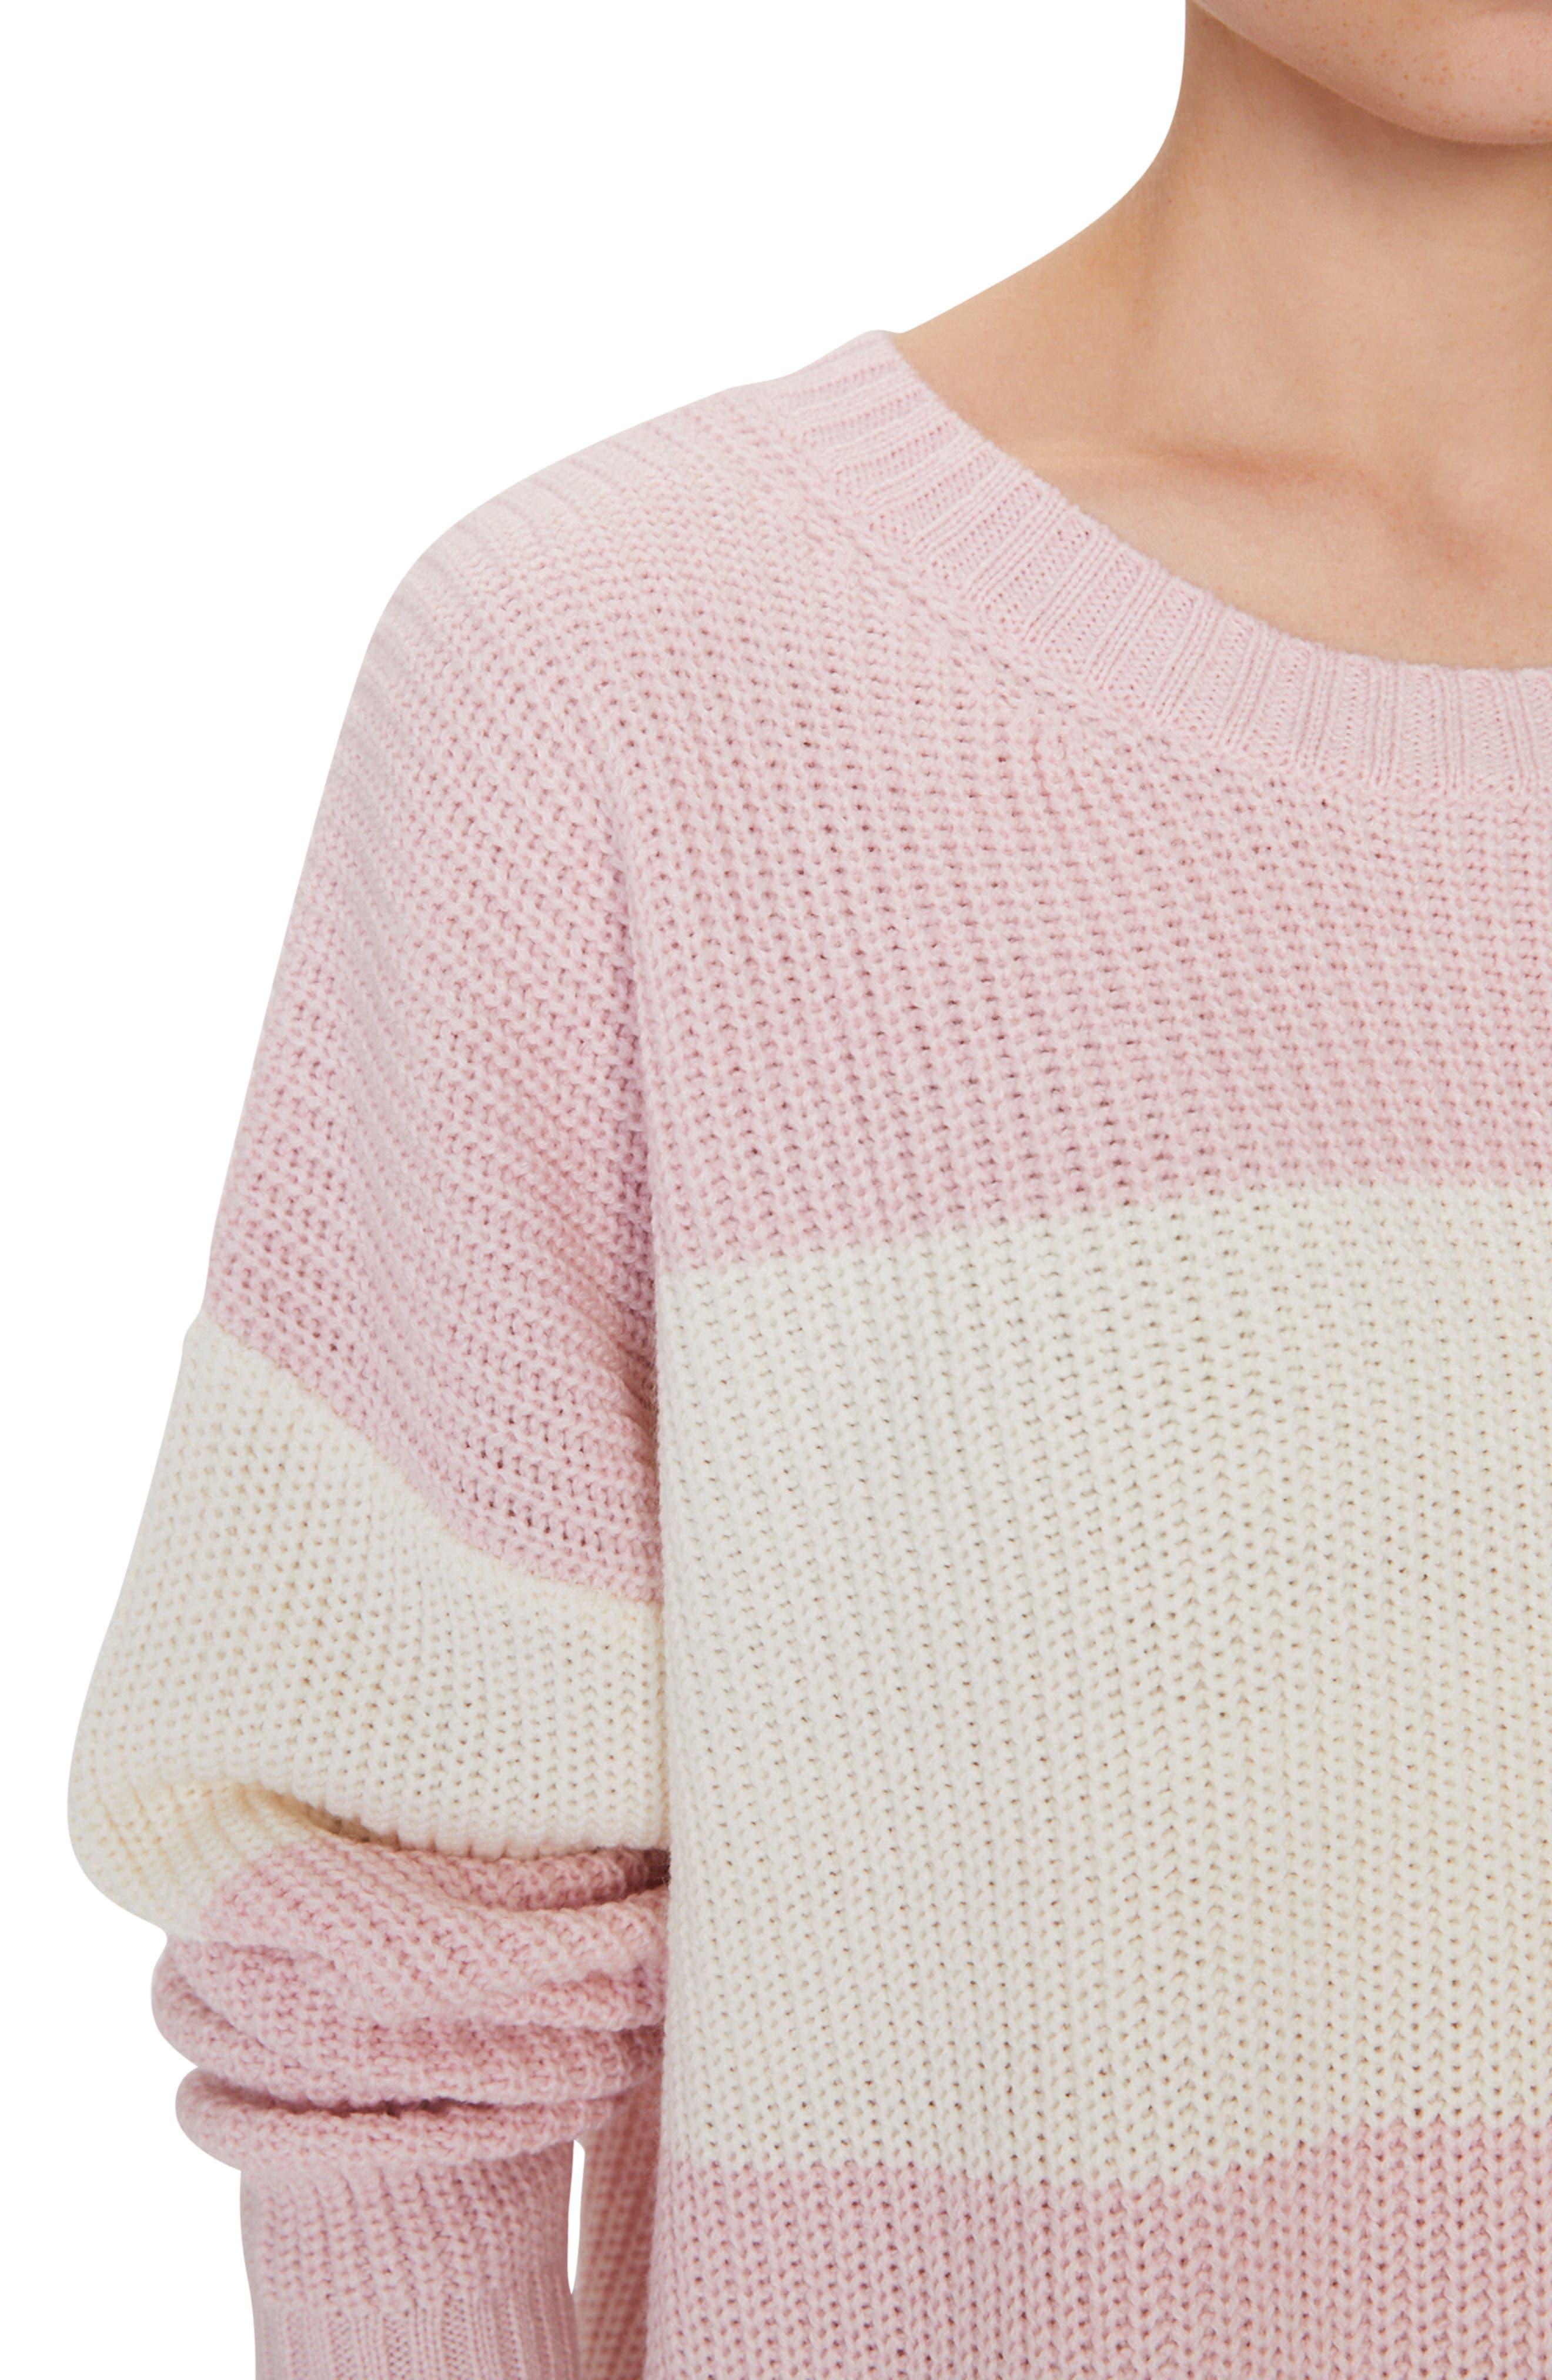 SANCTUARY,                             Billie Colorblock Shaker Sweater,                             Alternate thumbnail 4, color,                             HEATHER CHERRYBLOSSOM/ NATURAL